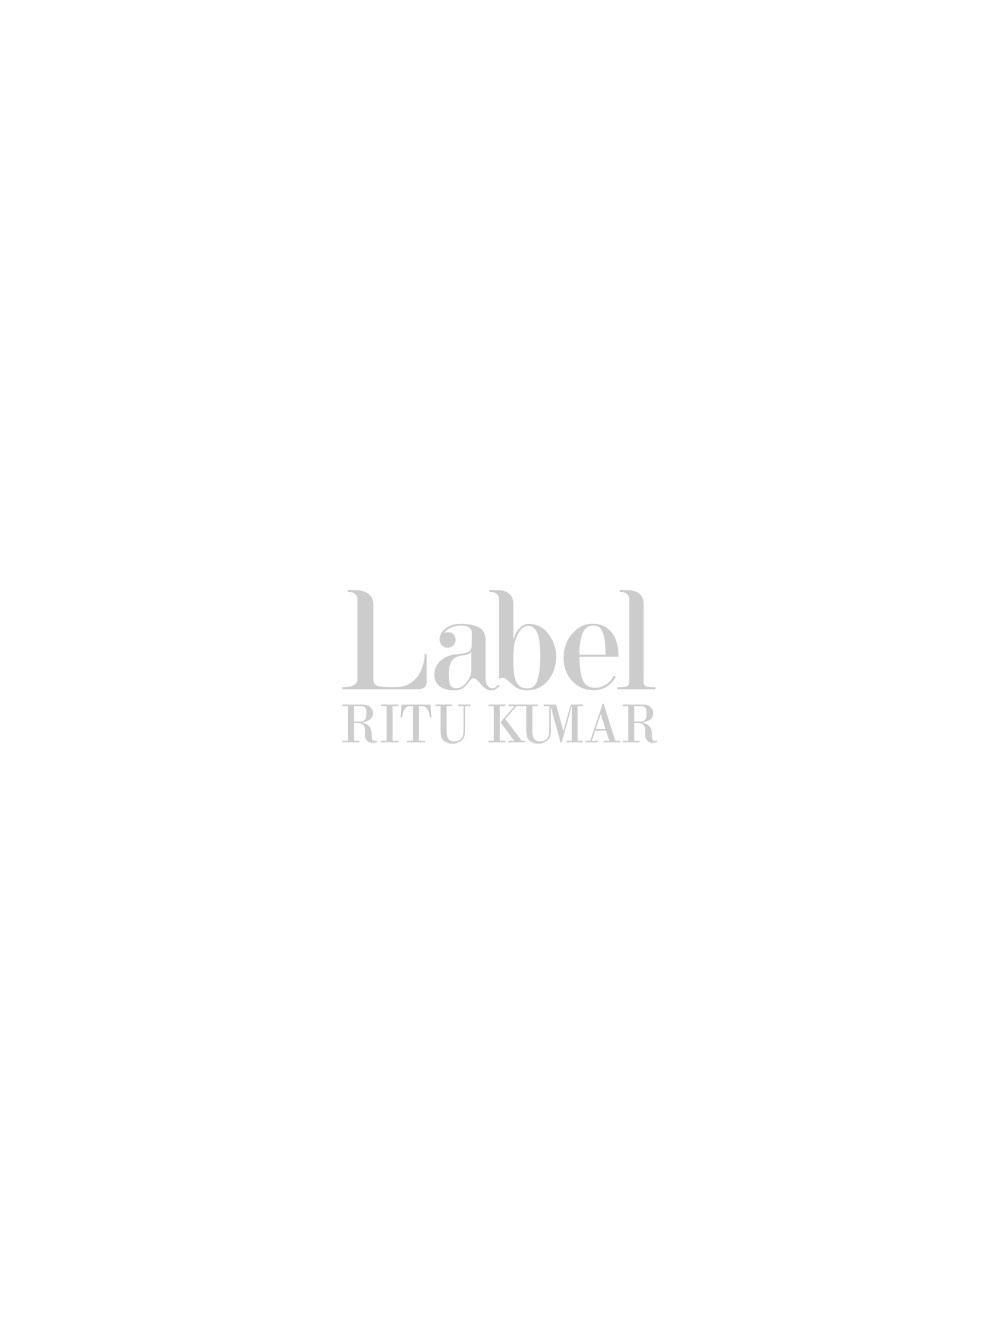 Tan Leather Tote By Label Ritu Kumar